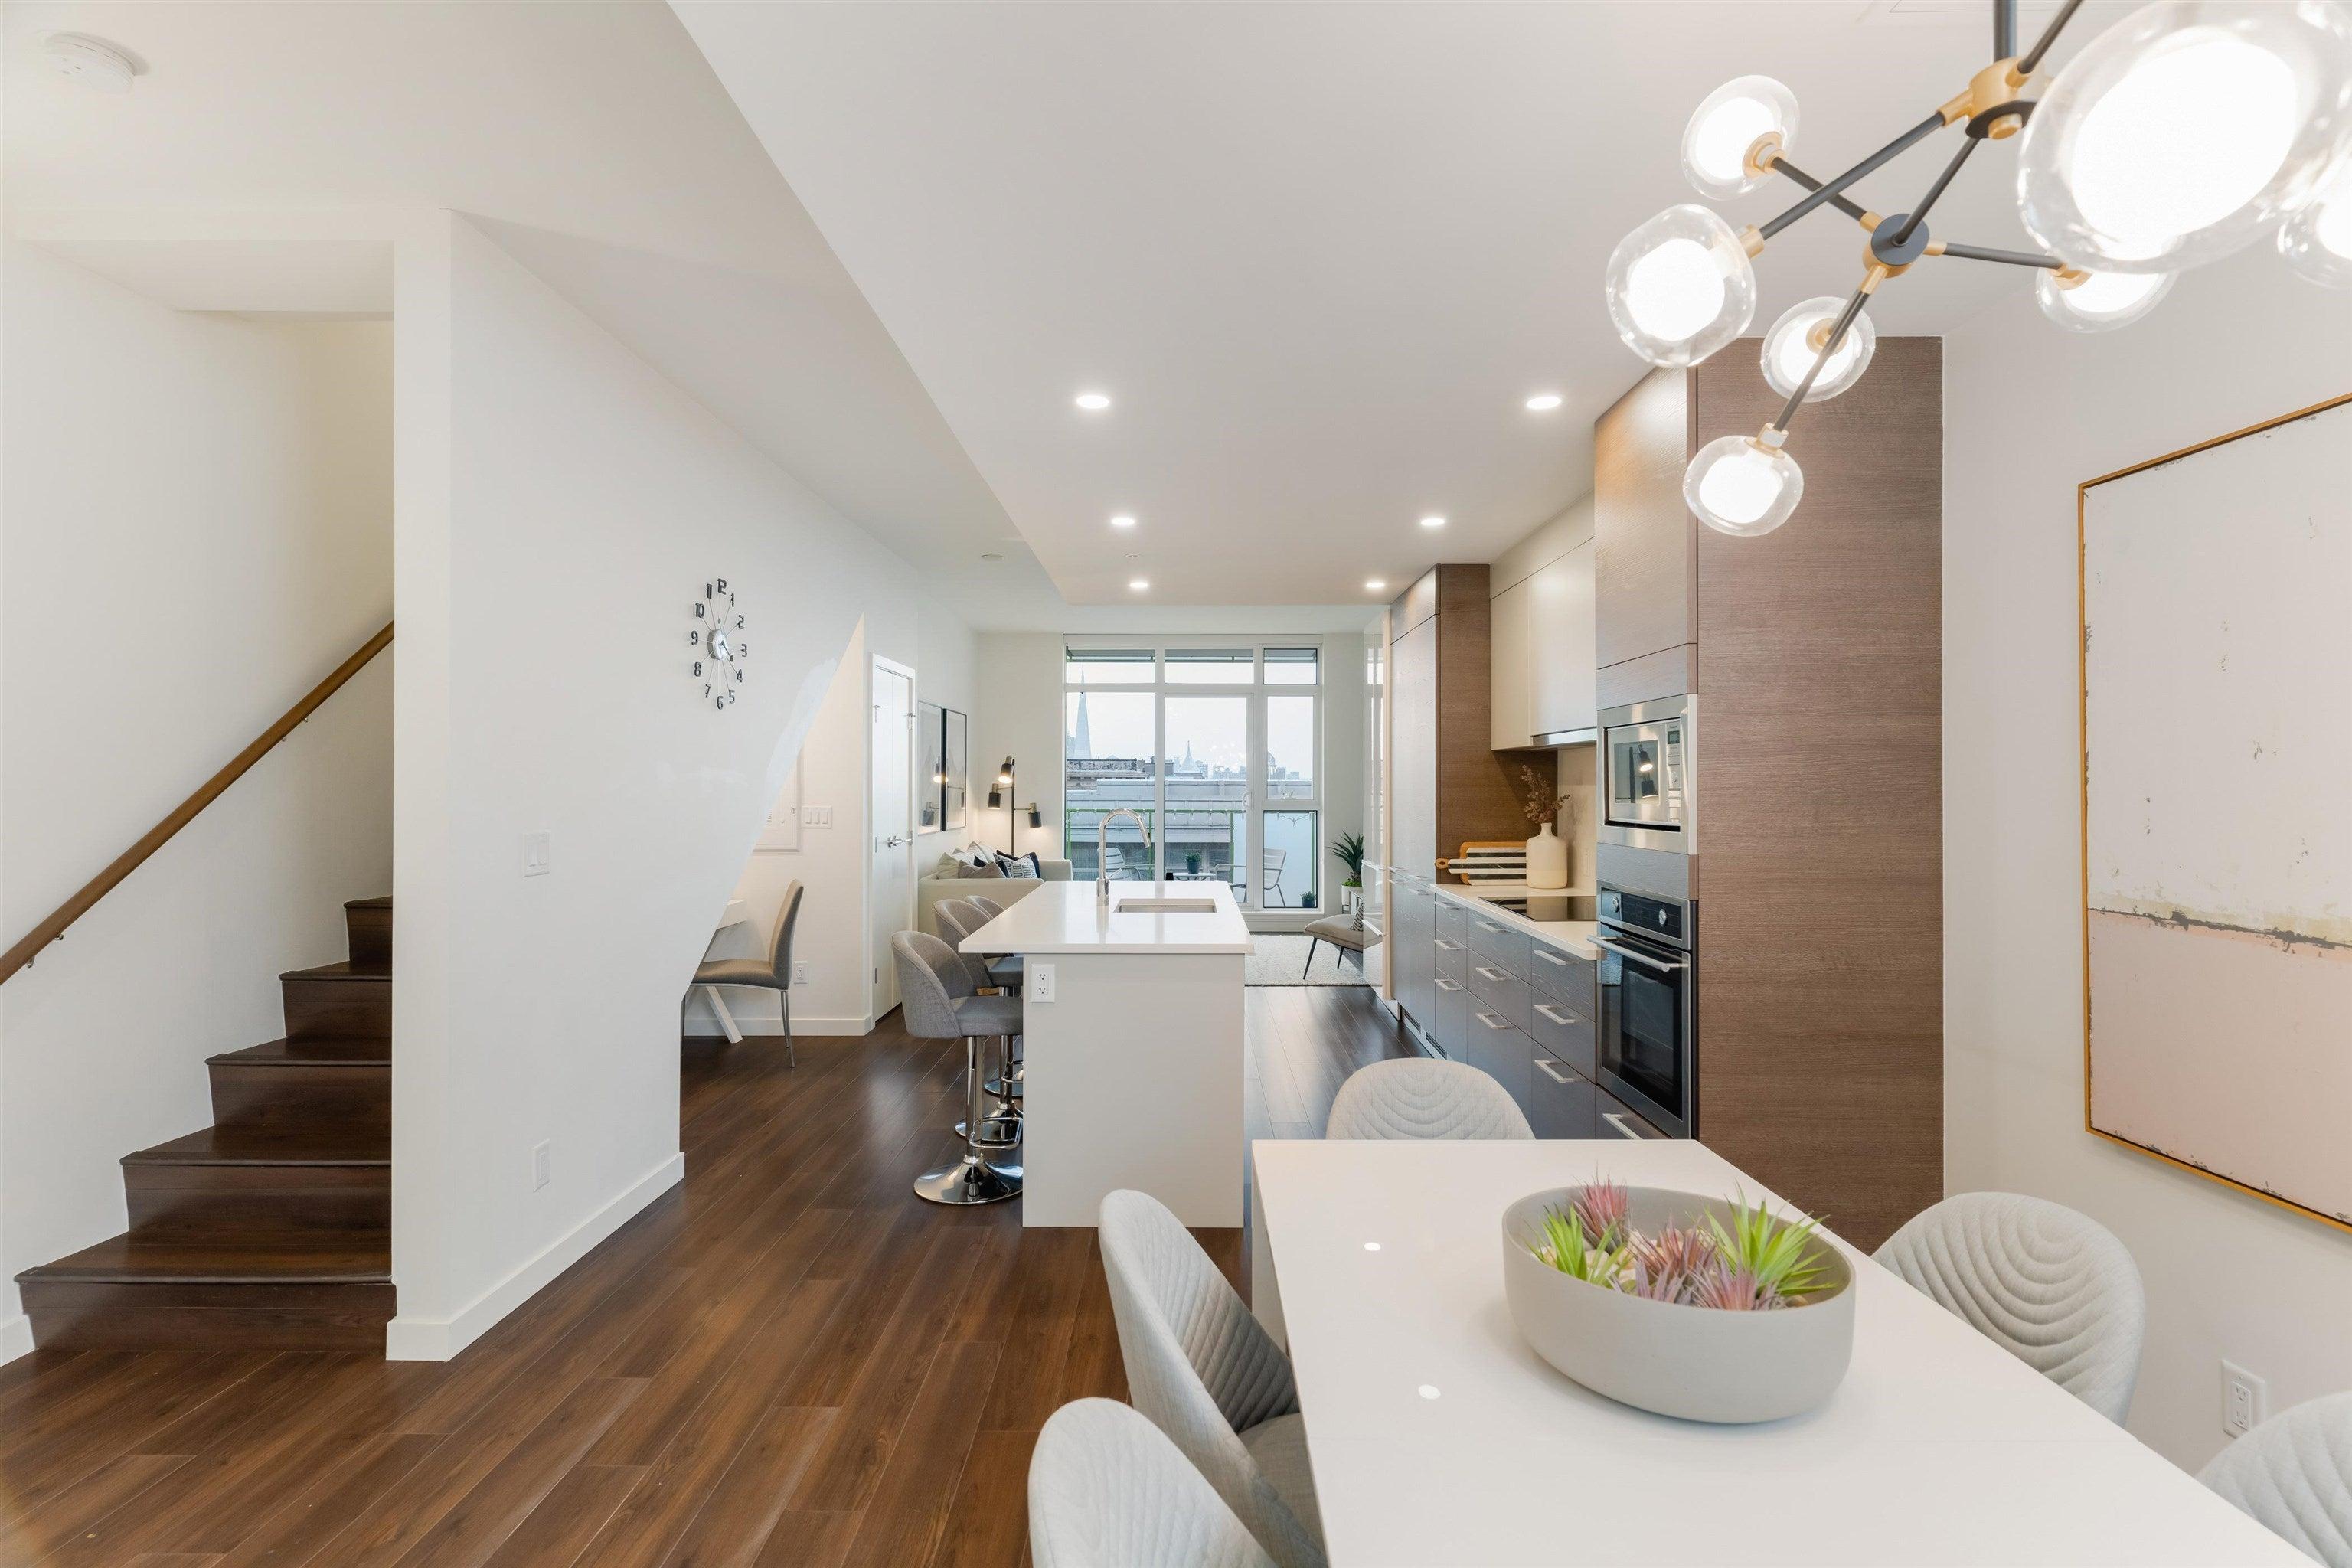 523 2508 WATSON STREET - Mount Pleasant VE Townhouse for sale, 3 Bedrooms (R2625701) - #13